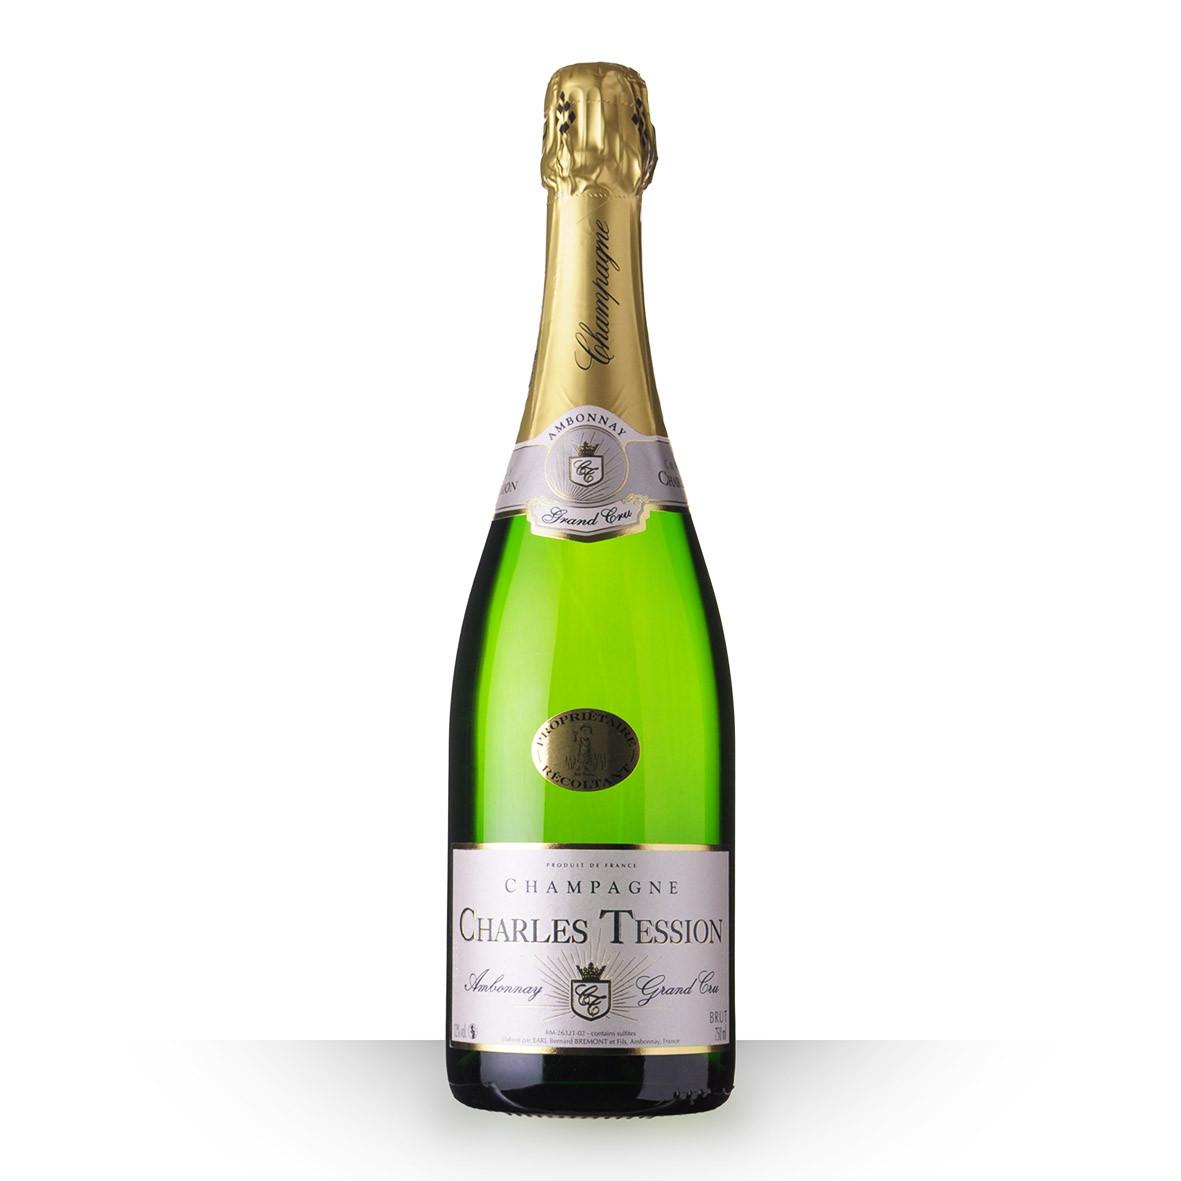 Champagne Charles Tession Brut 75cl Grand Cru www.odyssee-vins.com